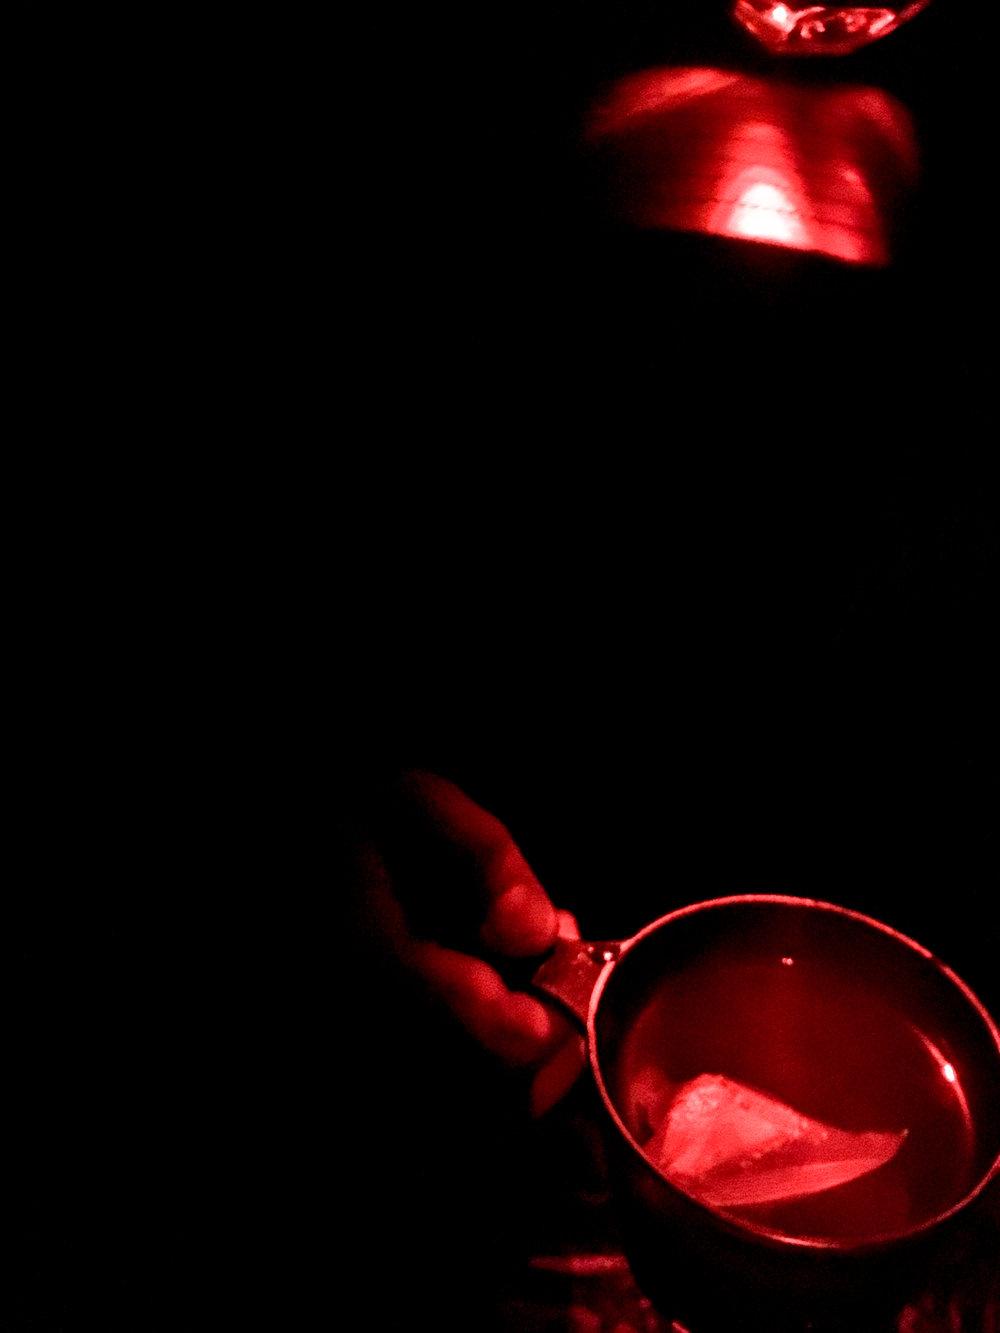 Tea by the light of Ben's headlamp...